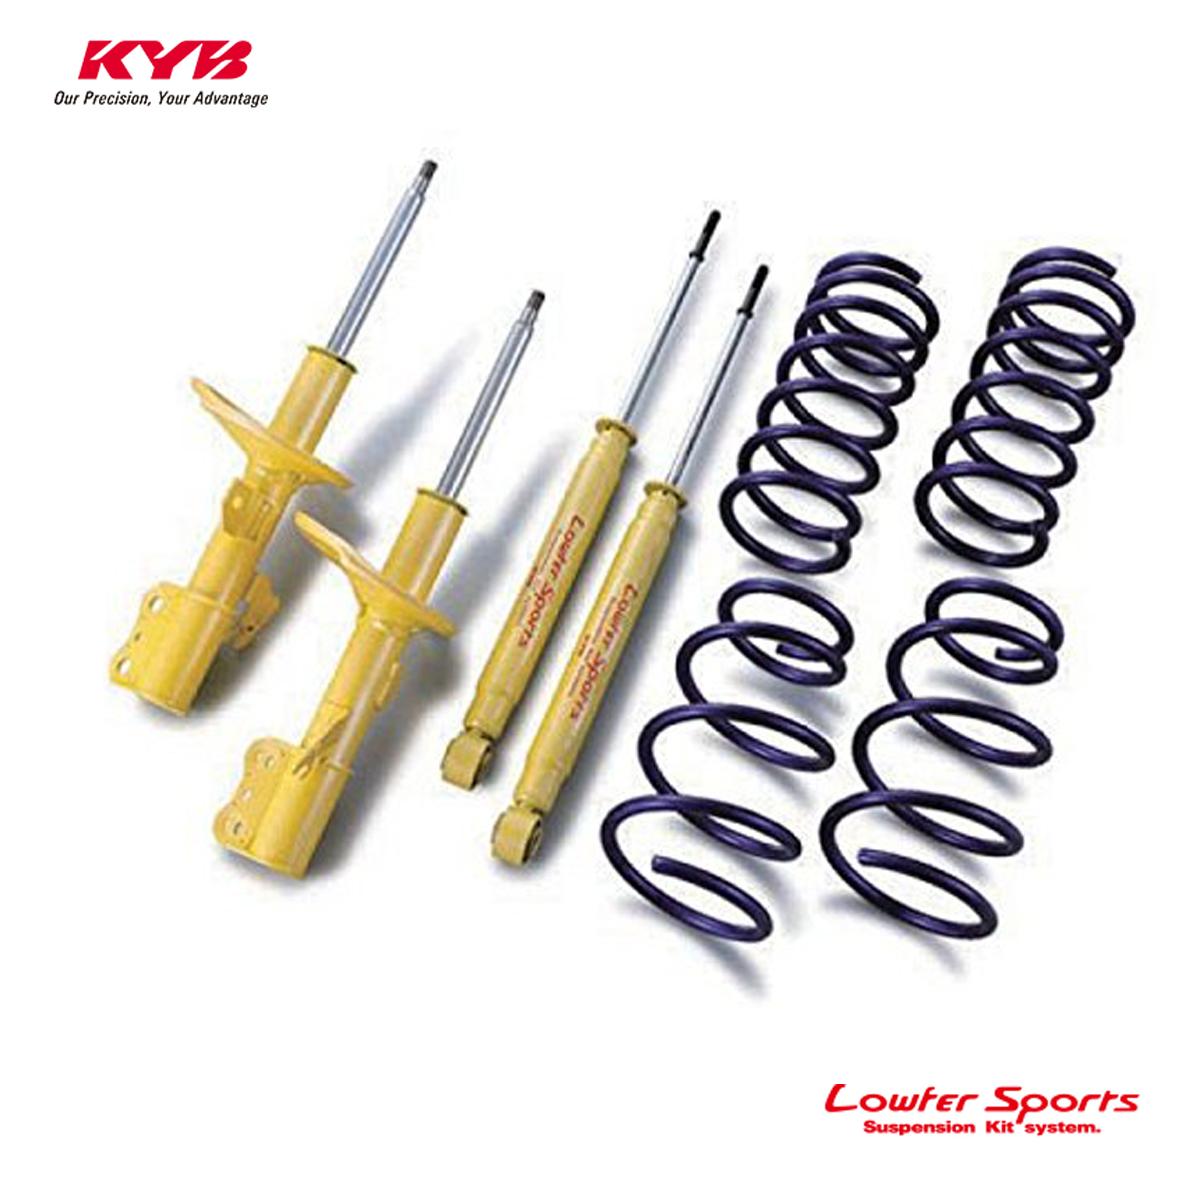 KYB カヤバ セレナ TC24 ショックアブソーバー サスペンションキット Lowfer Sports LKIT-TC24 配送先条件有り